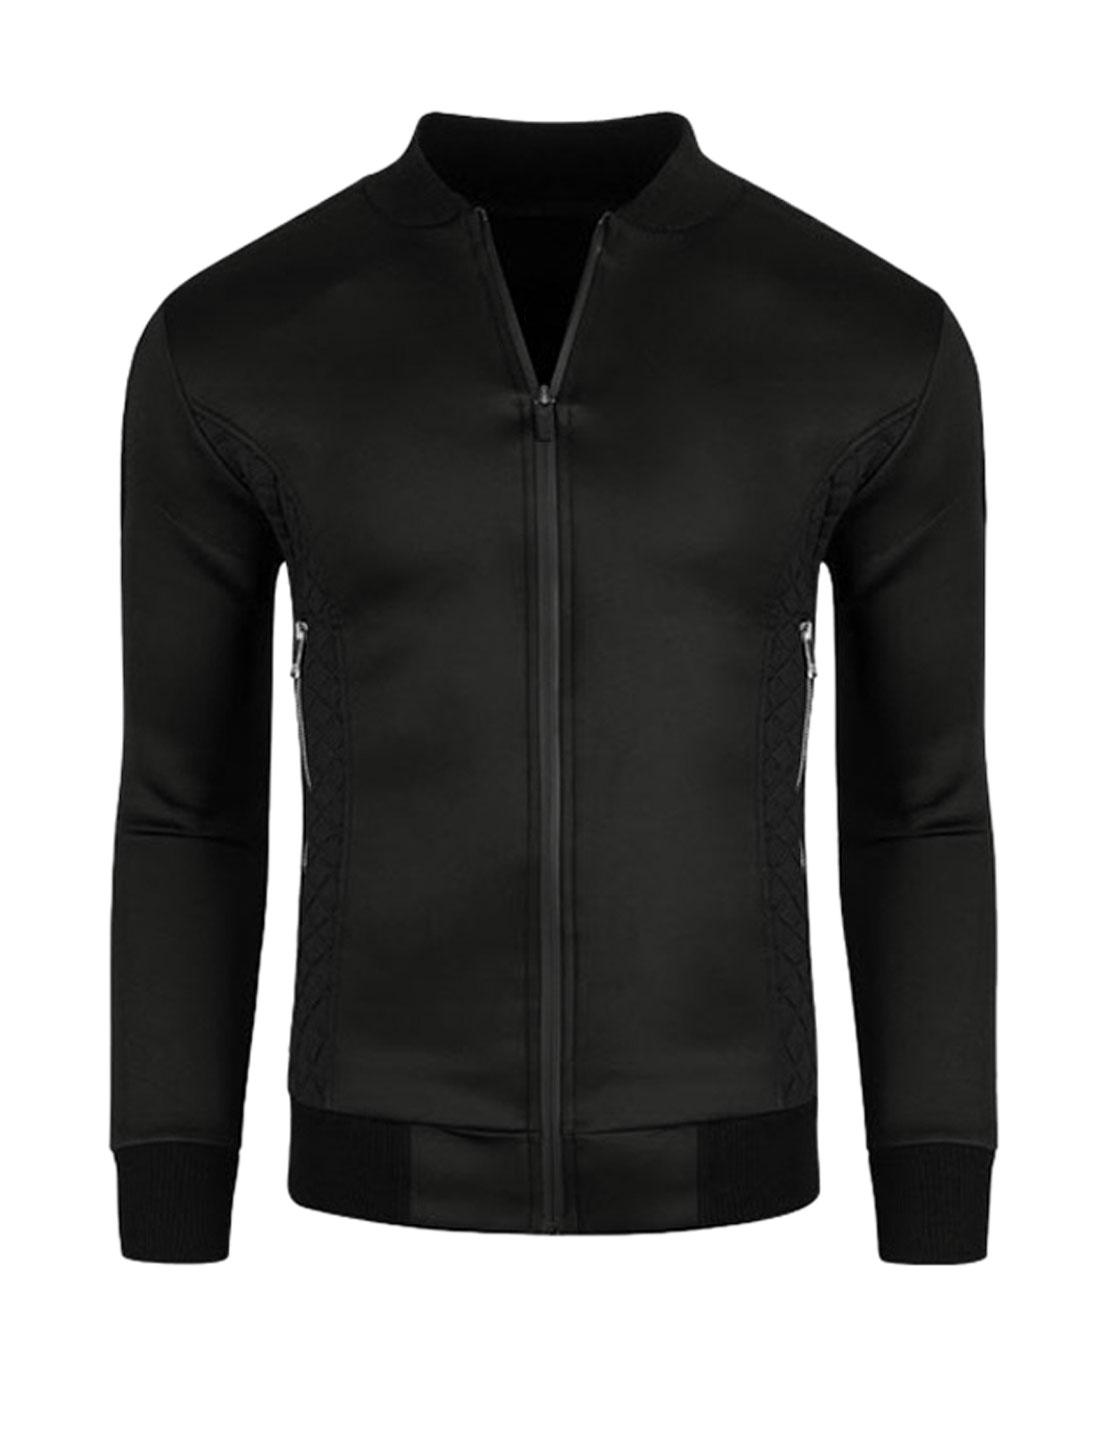 Men Zippered Pockets Quilted Panel Slim Fit Jacket Black M